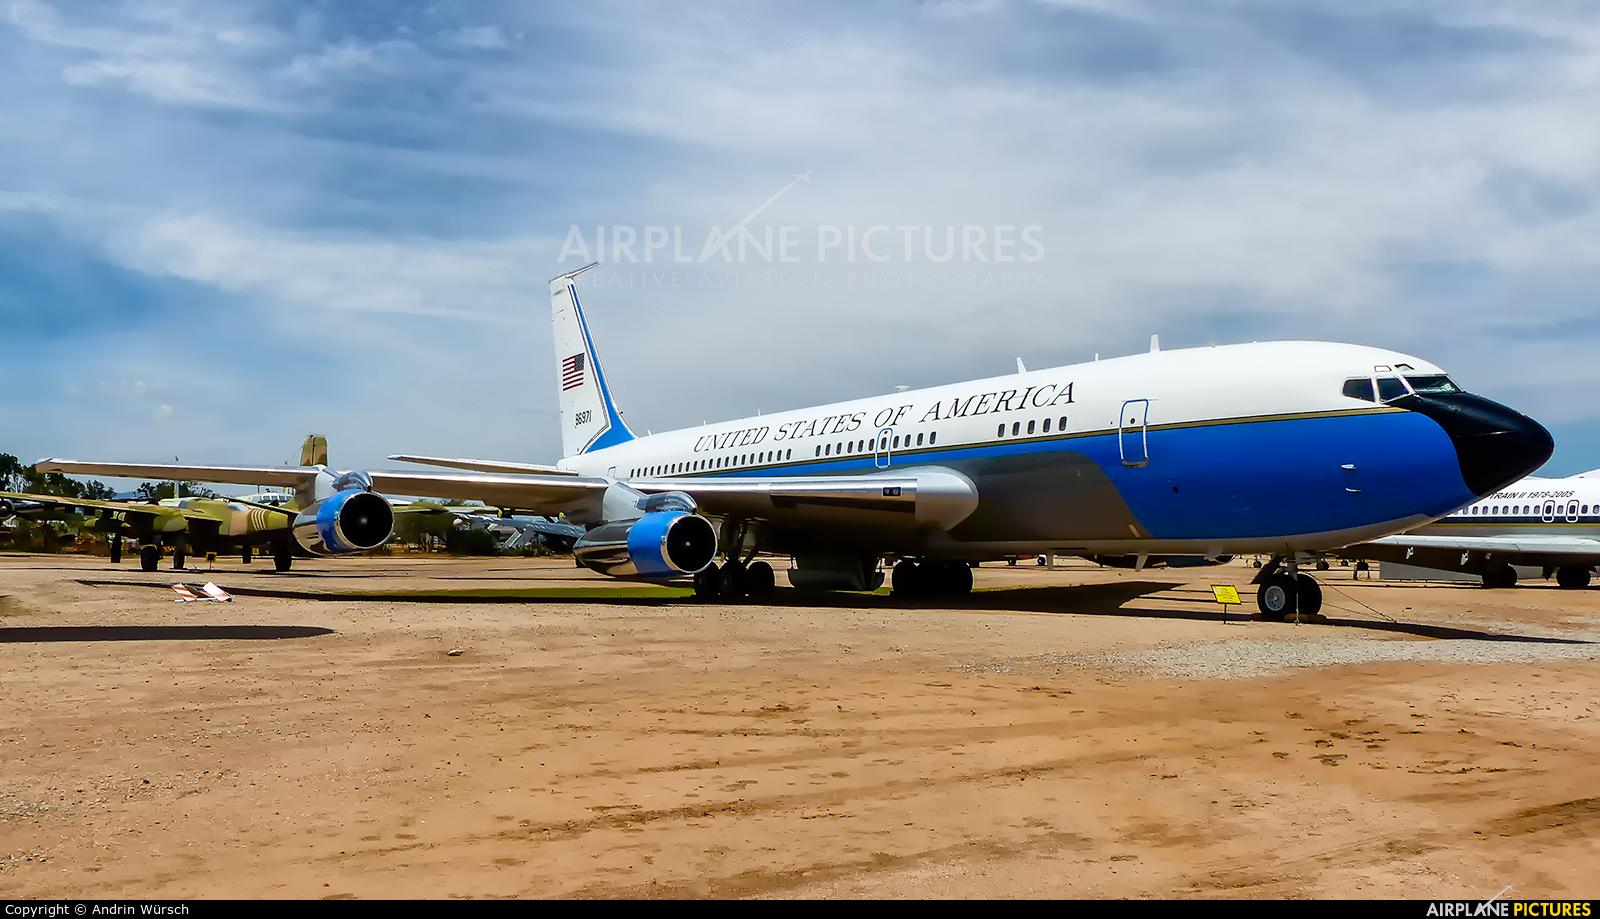 USA - Air Force 58-6971 aircraft at Tucson - Pima Air & Space Museum